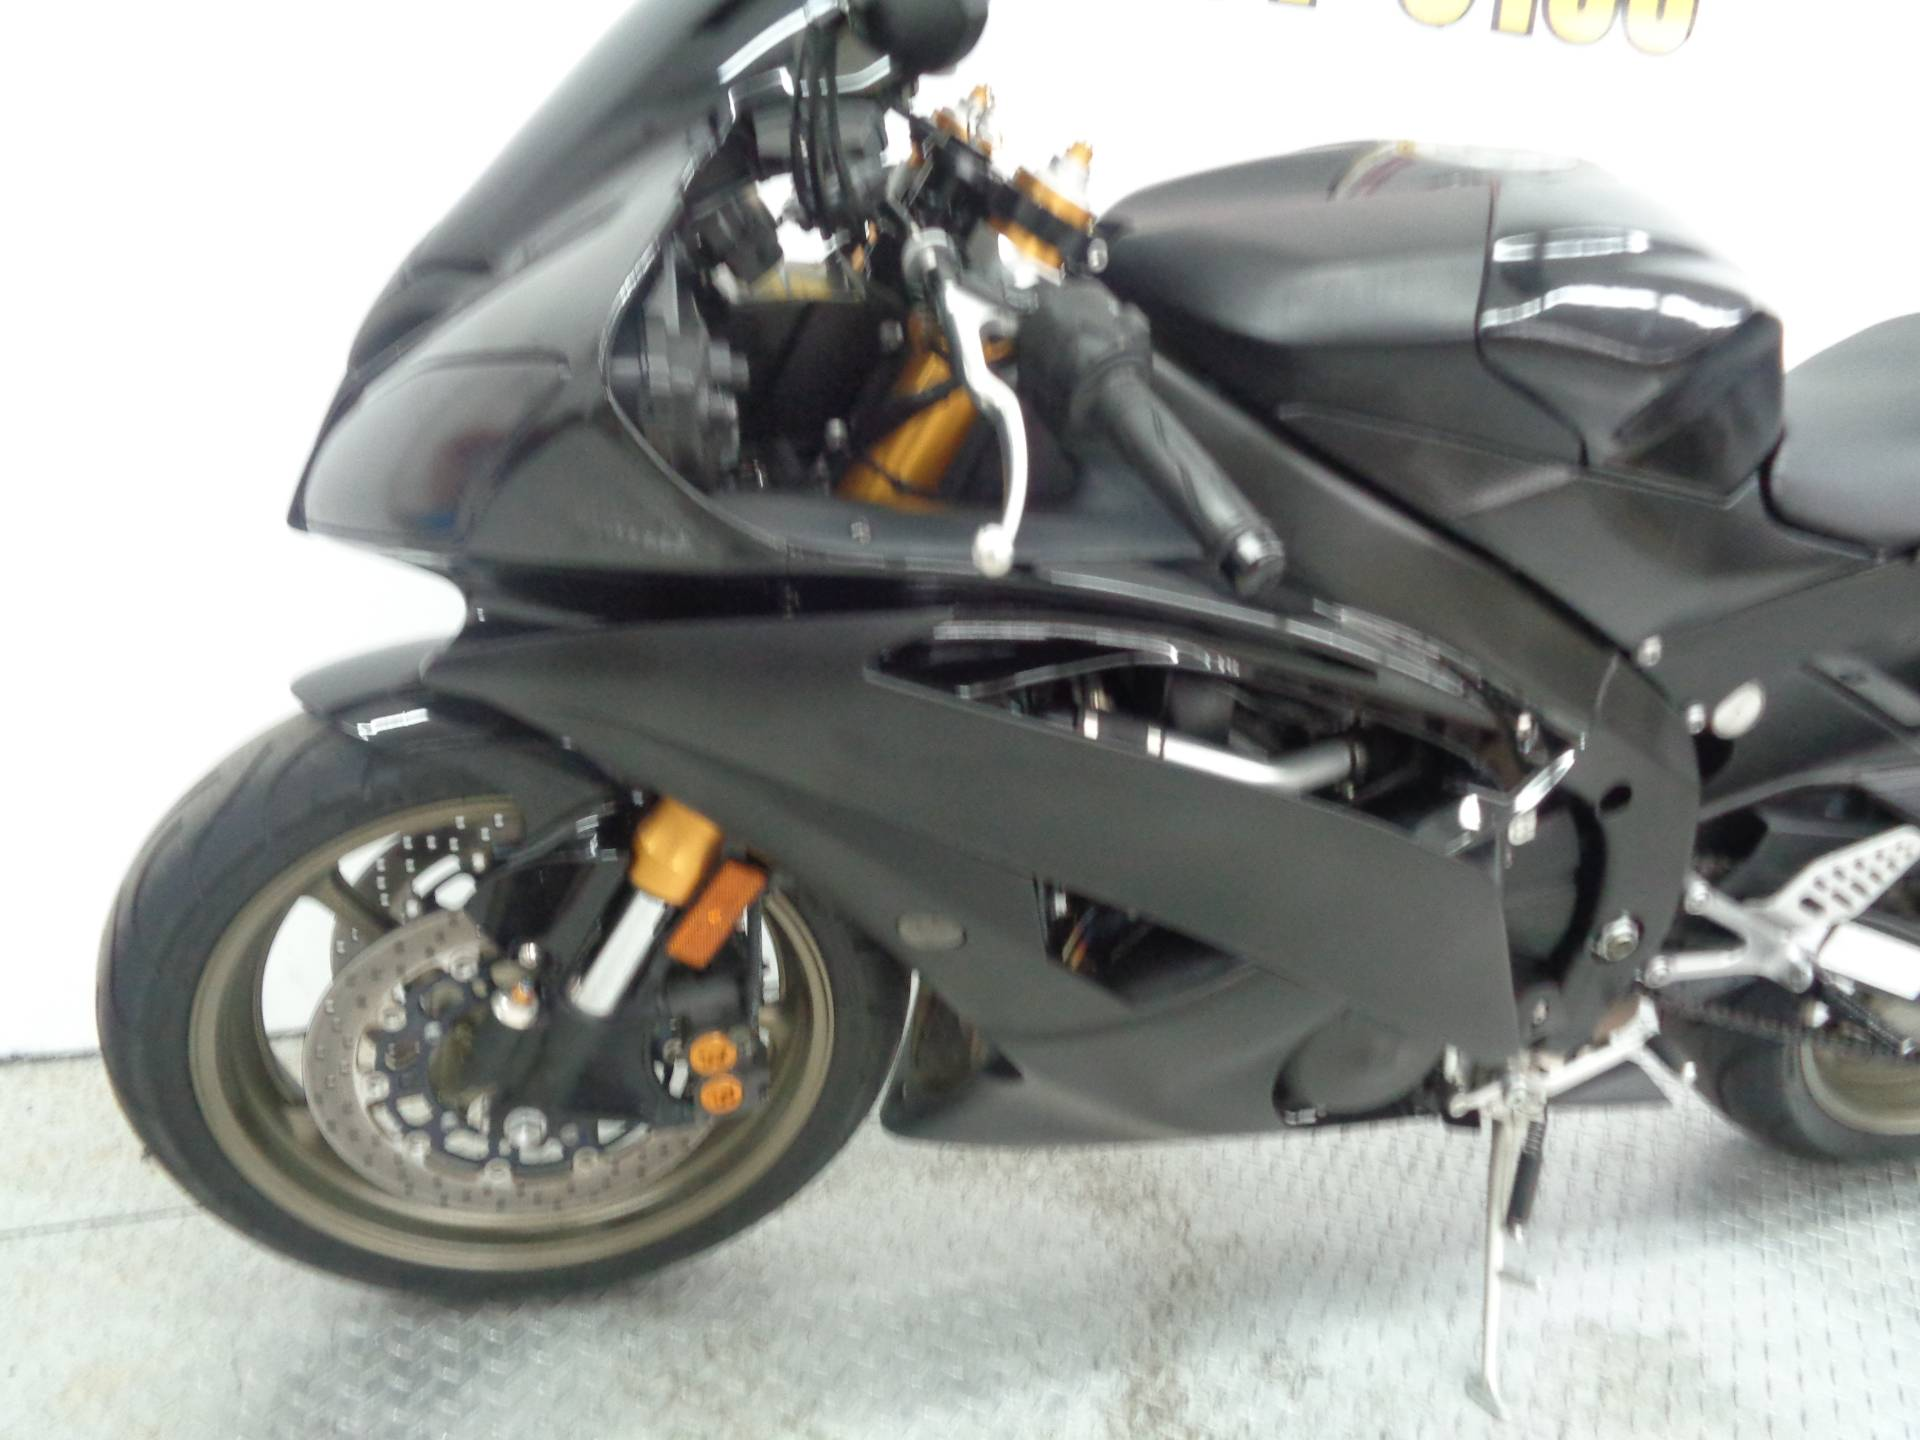 2008 Yamaha YZF-R6 5